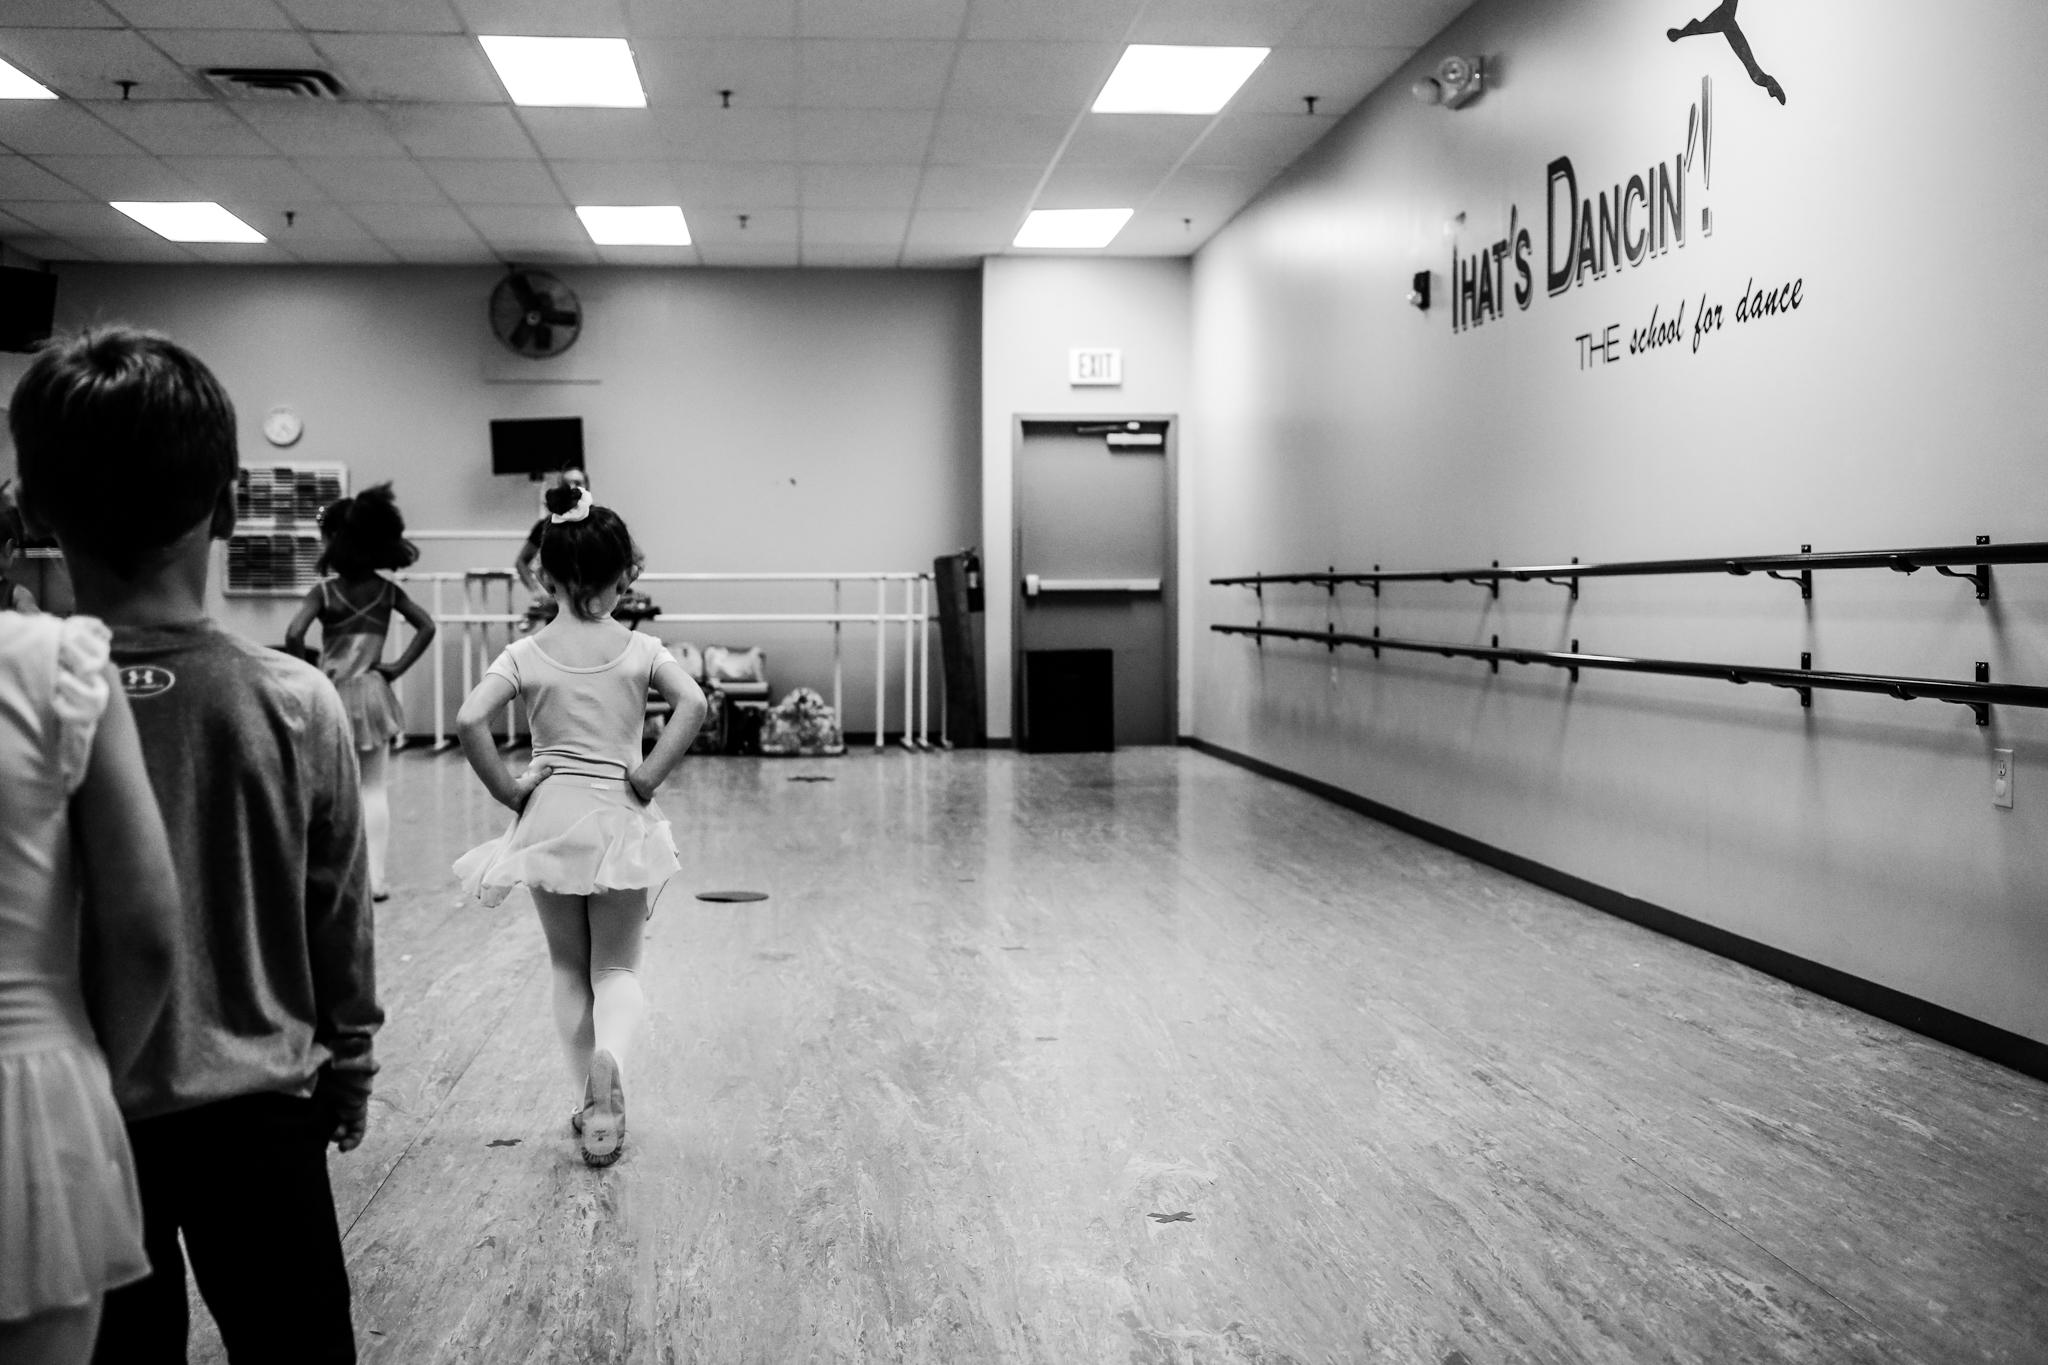 That's Dancin' School for Dance in Trexlertown, PA.